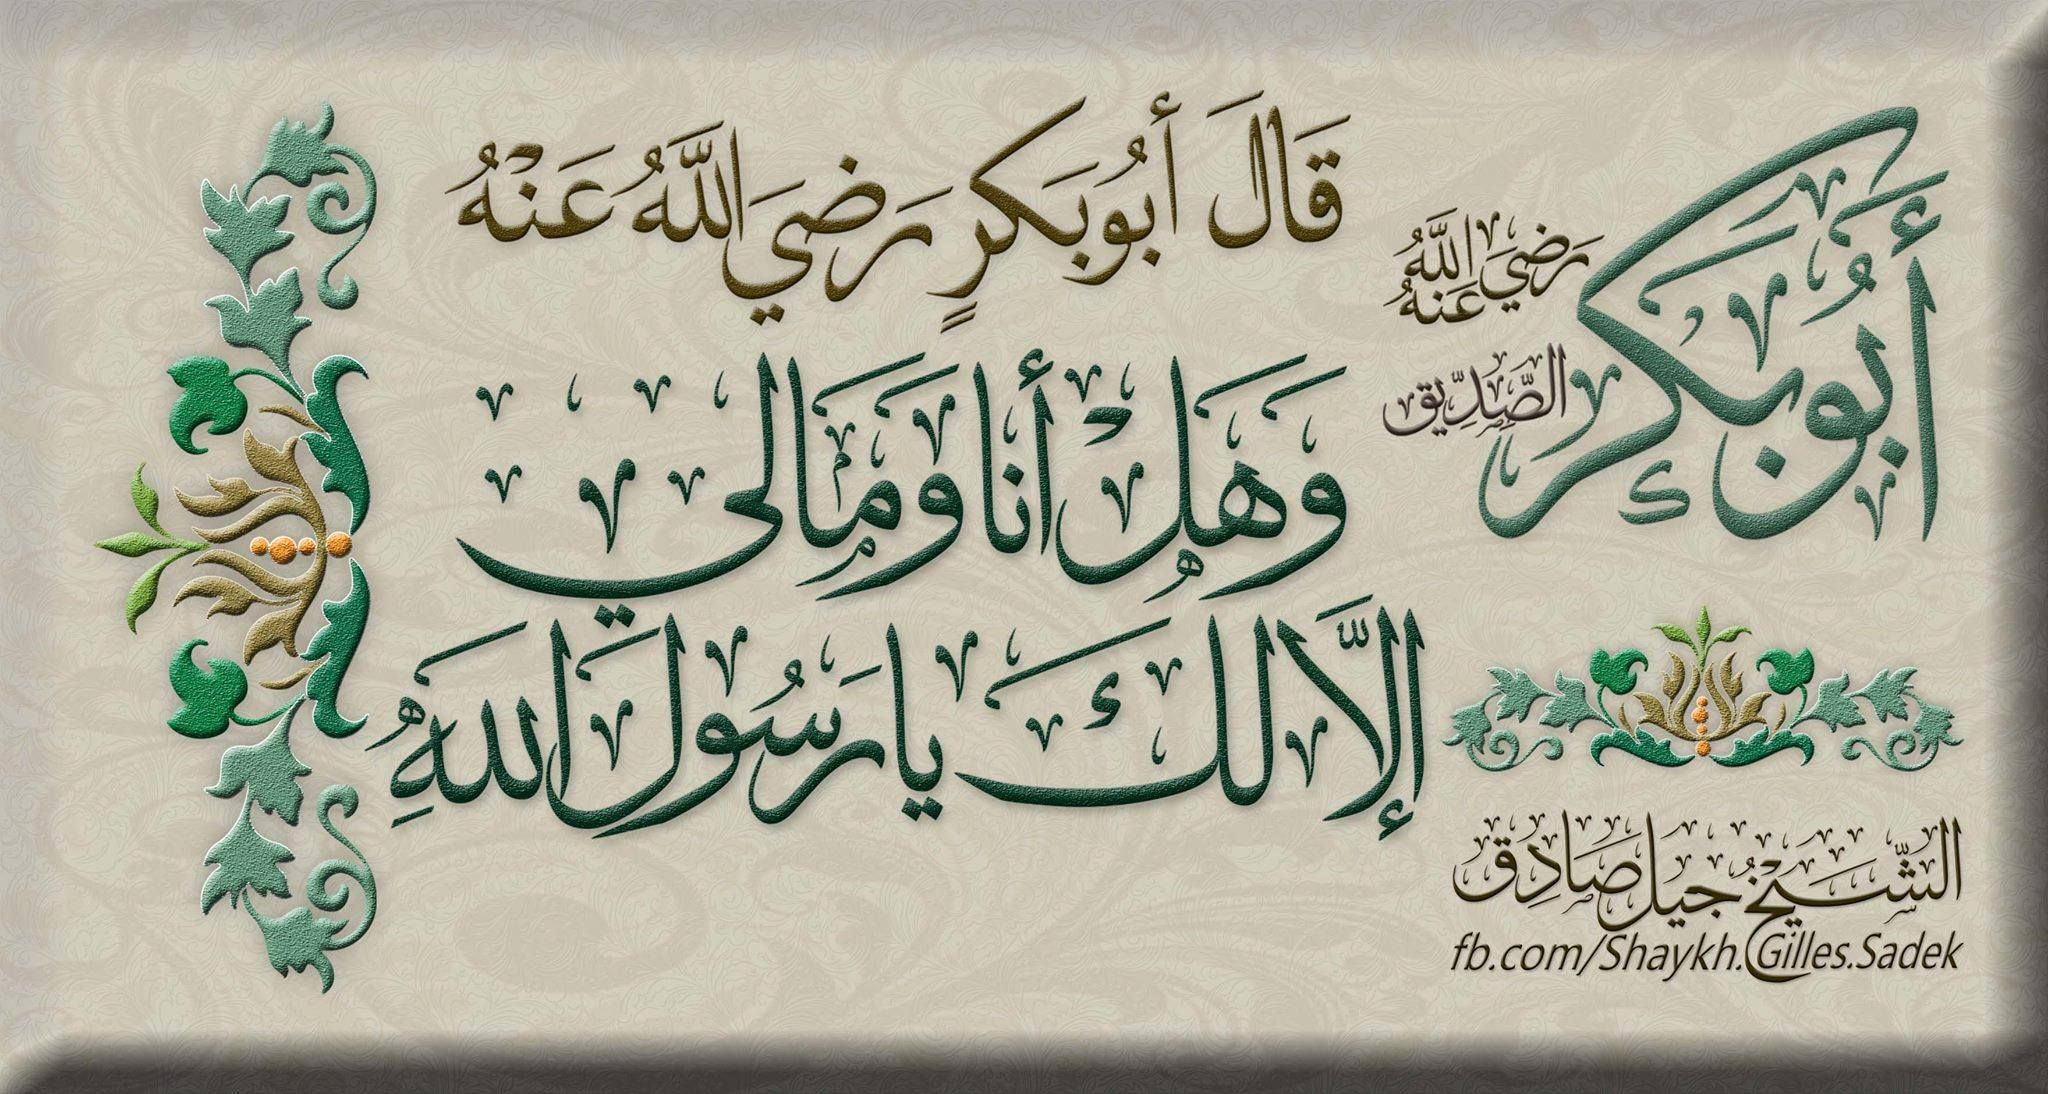 Shaykh Gilles Sadek Arabic Calligraphy Islam Arabic